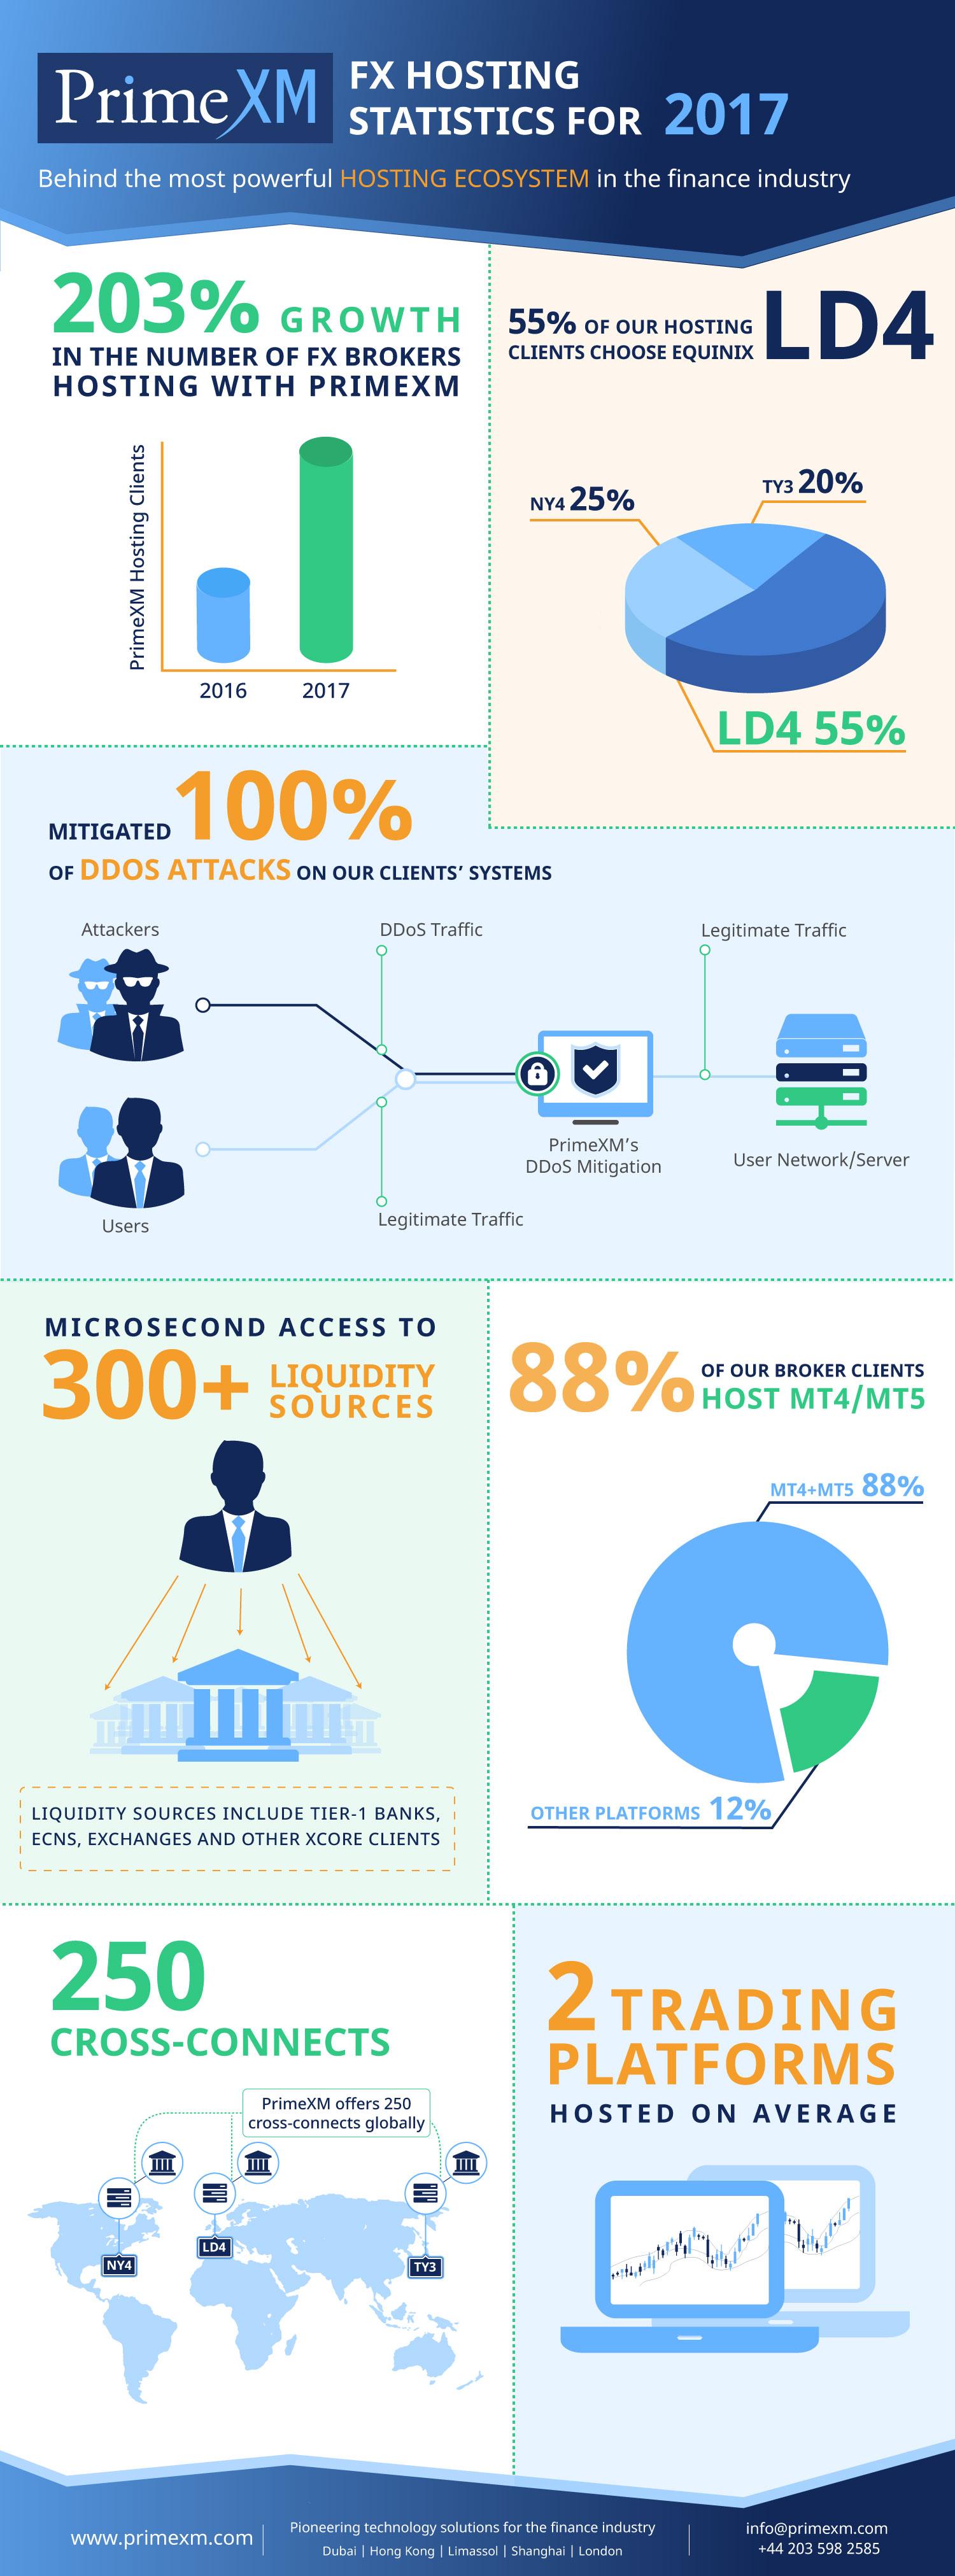 PrimeXM Hosting Statistics Infographic